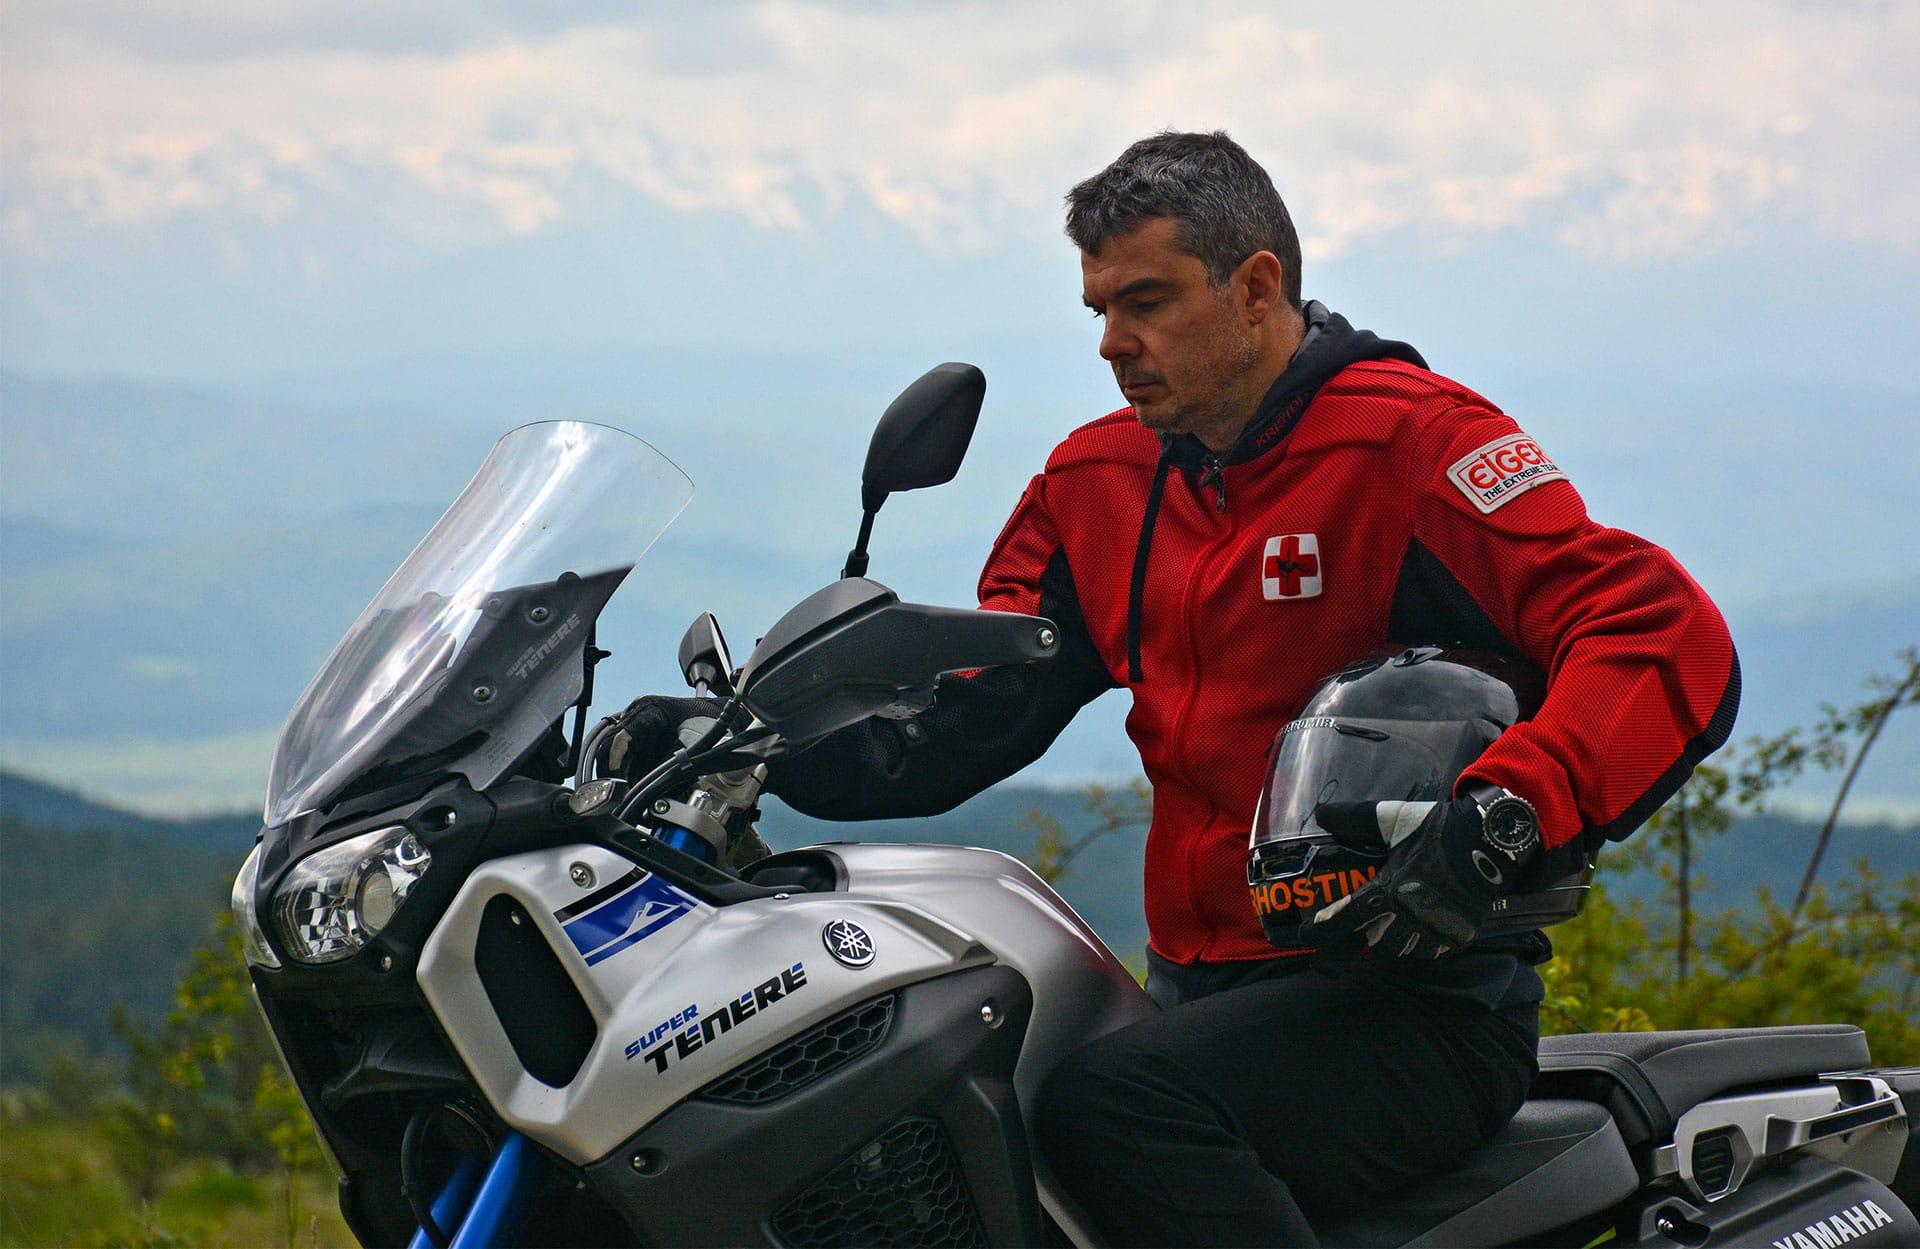 yamaha Motorbike Adventure